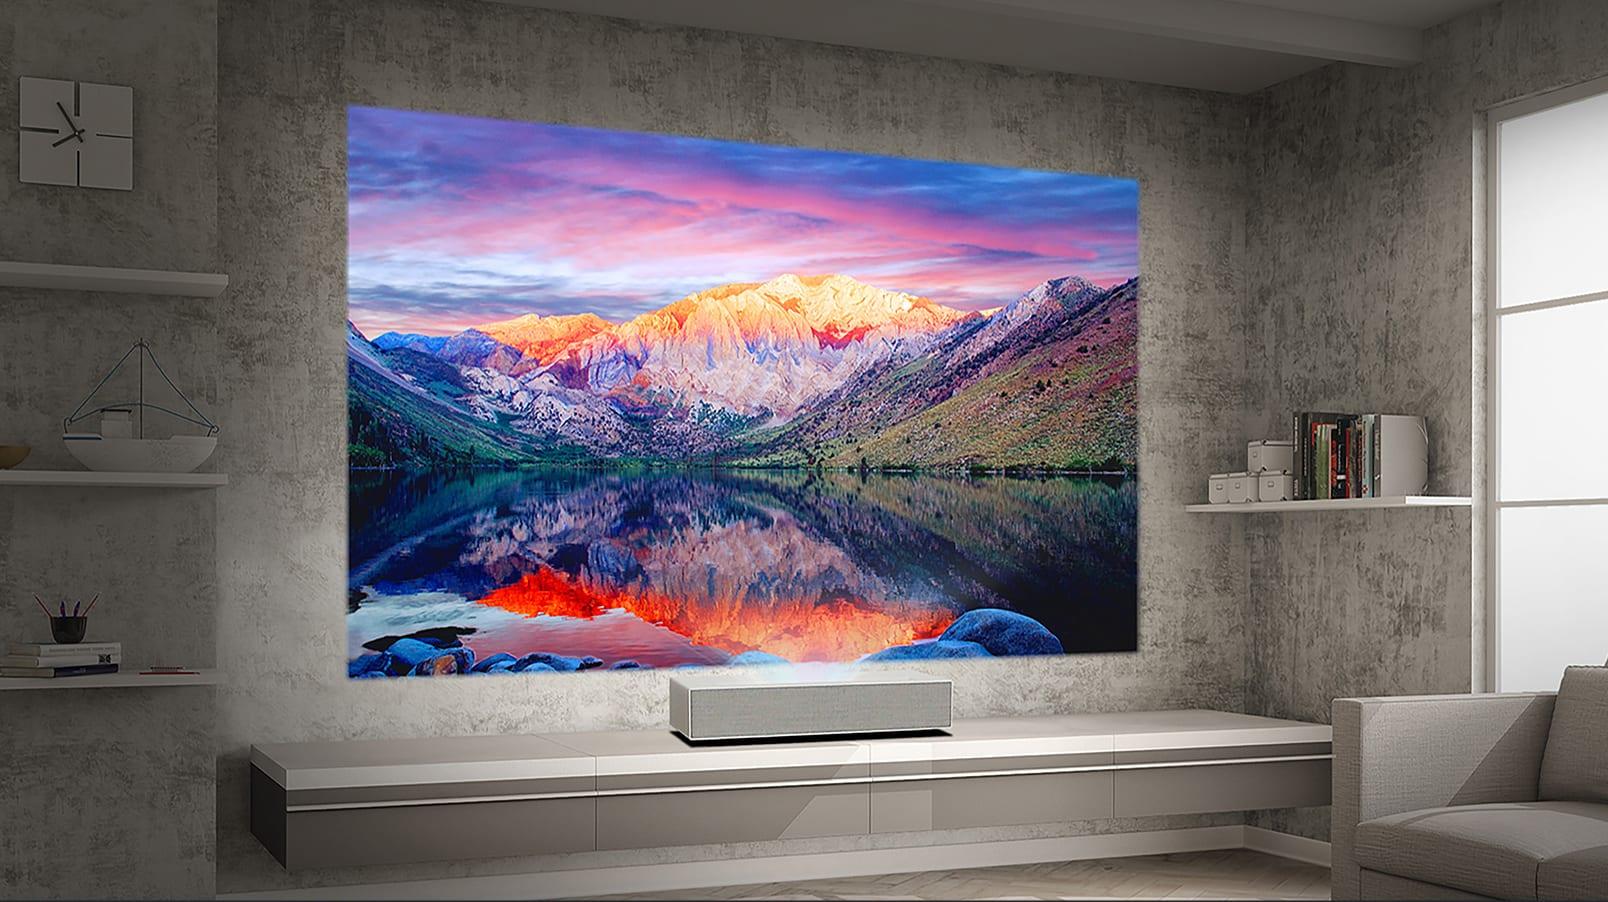 proyector o smart tv